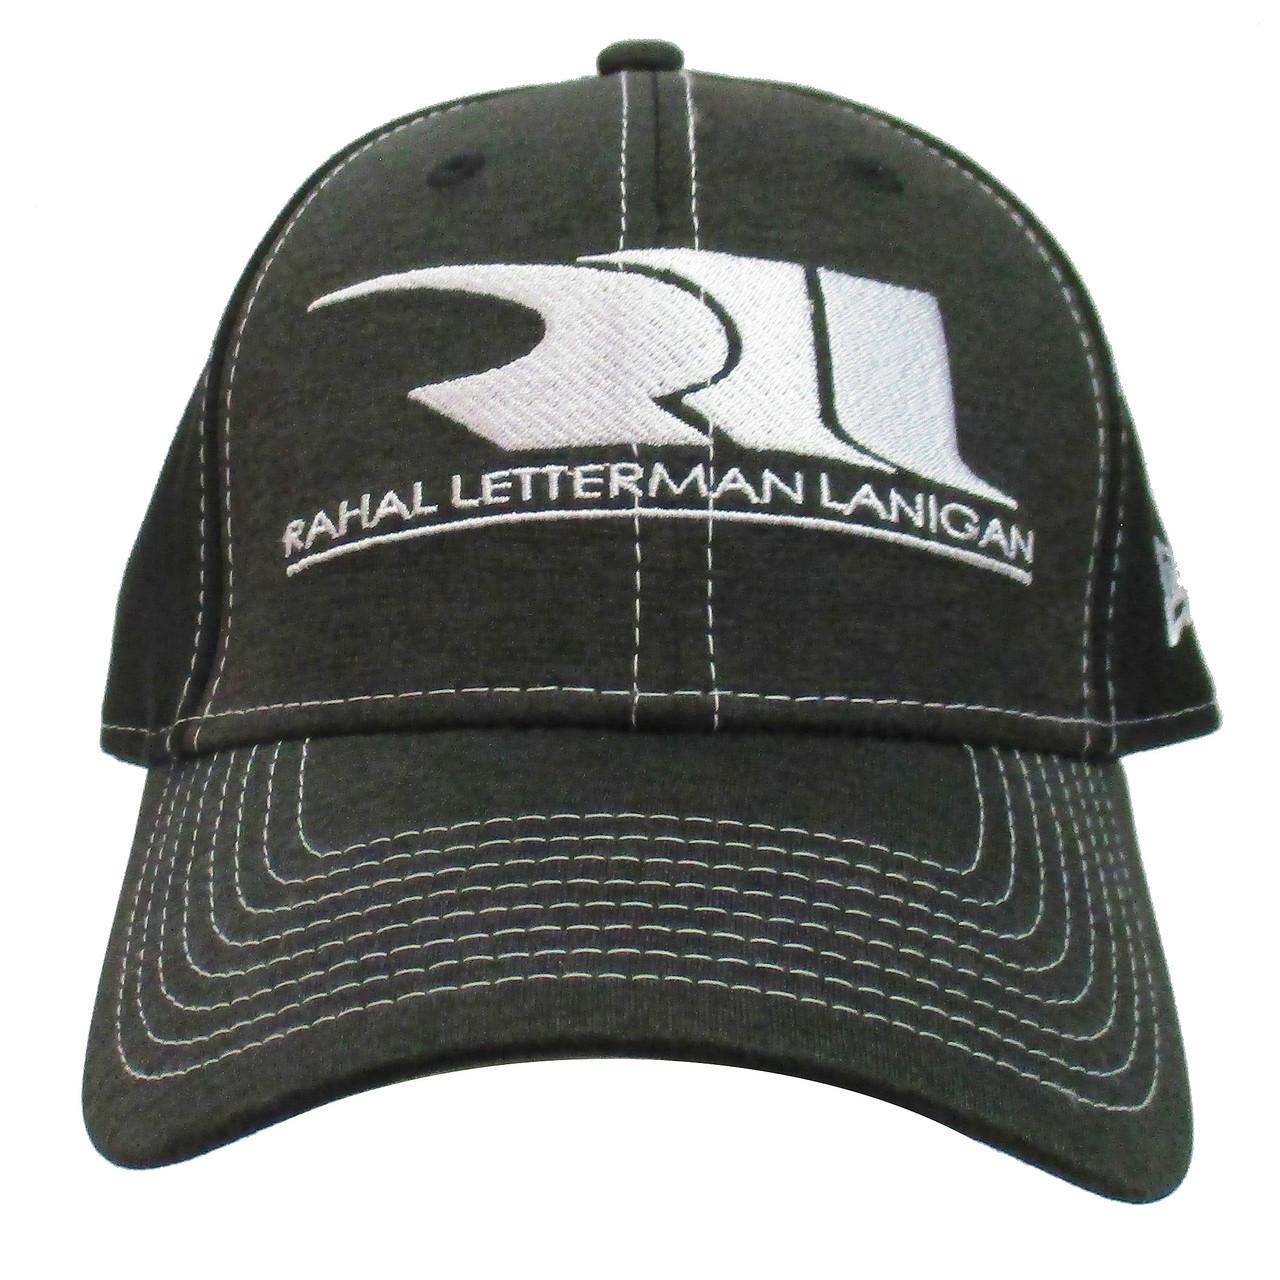 7ac44259 Rahal Letterman Lanigan RLL New Era 9FORTY Cap - Indianapolis Motor Speedway /INDYCAR